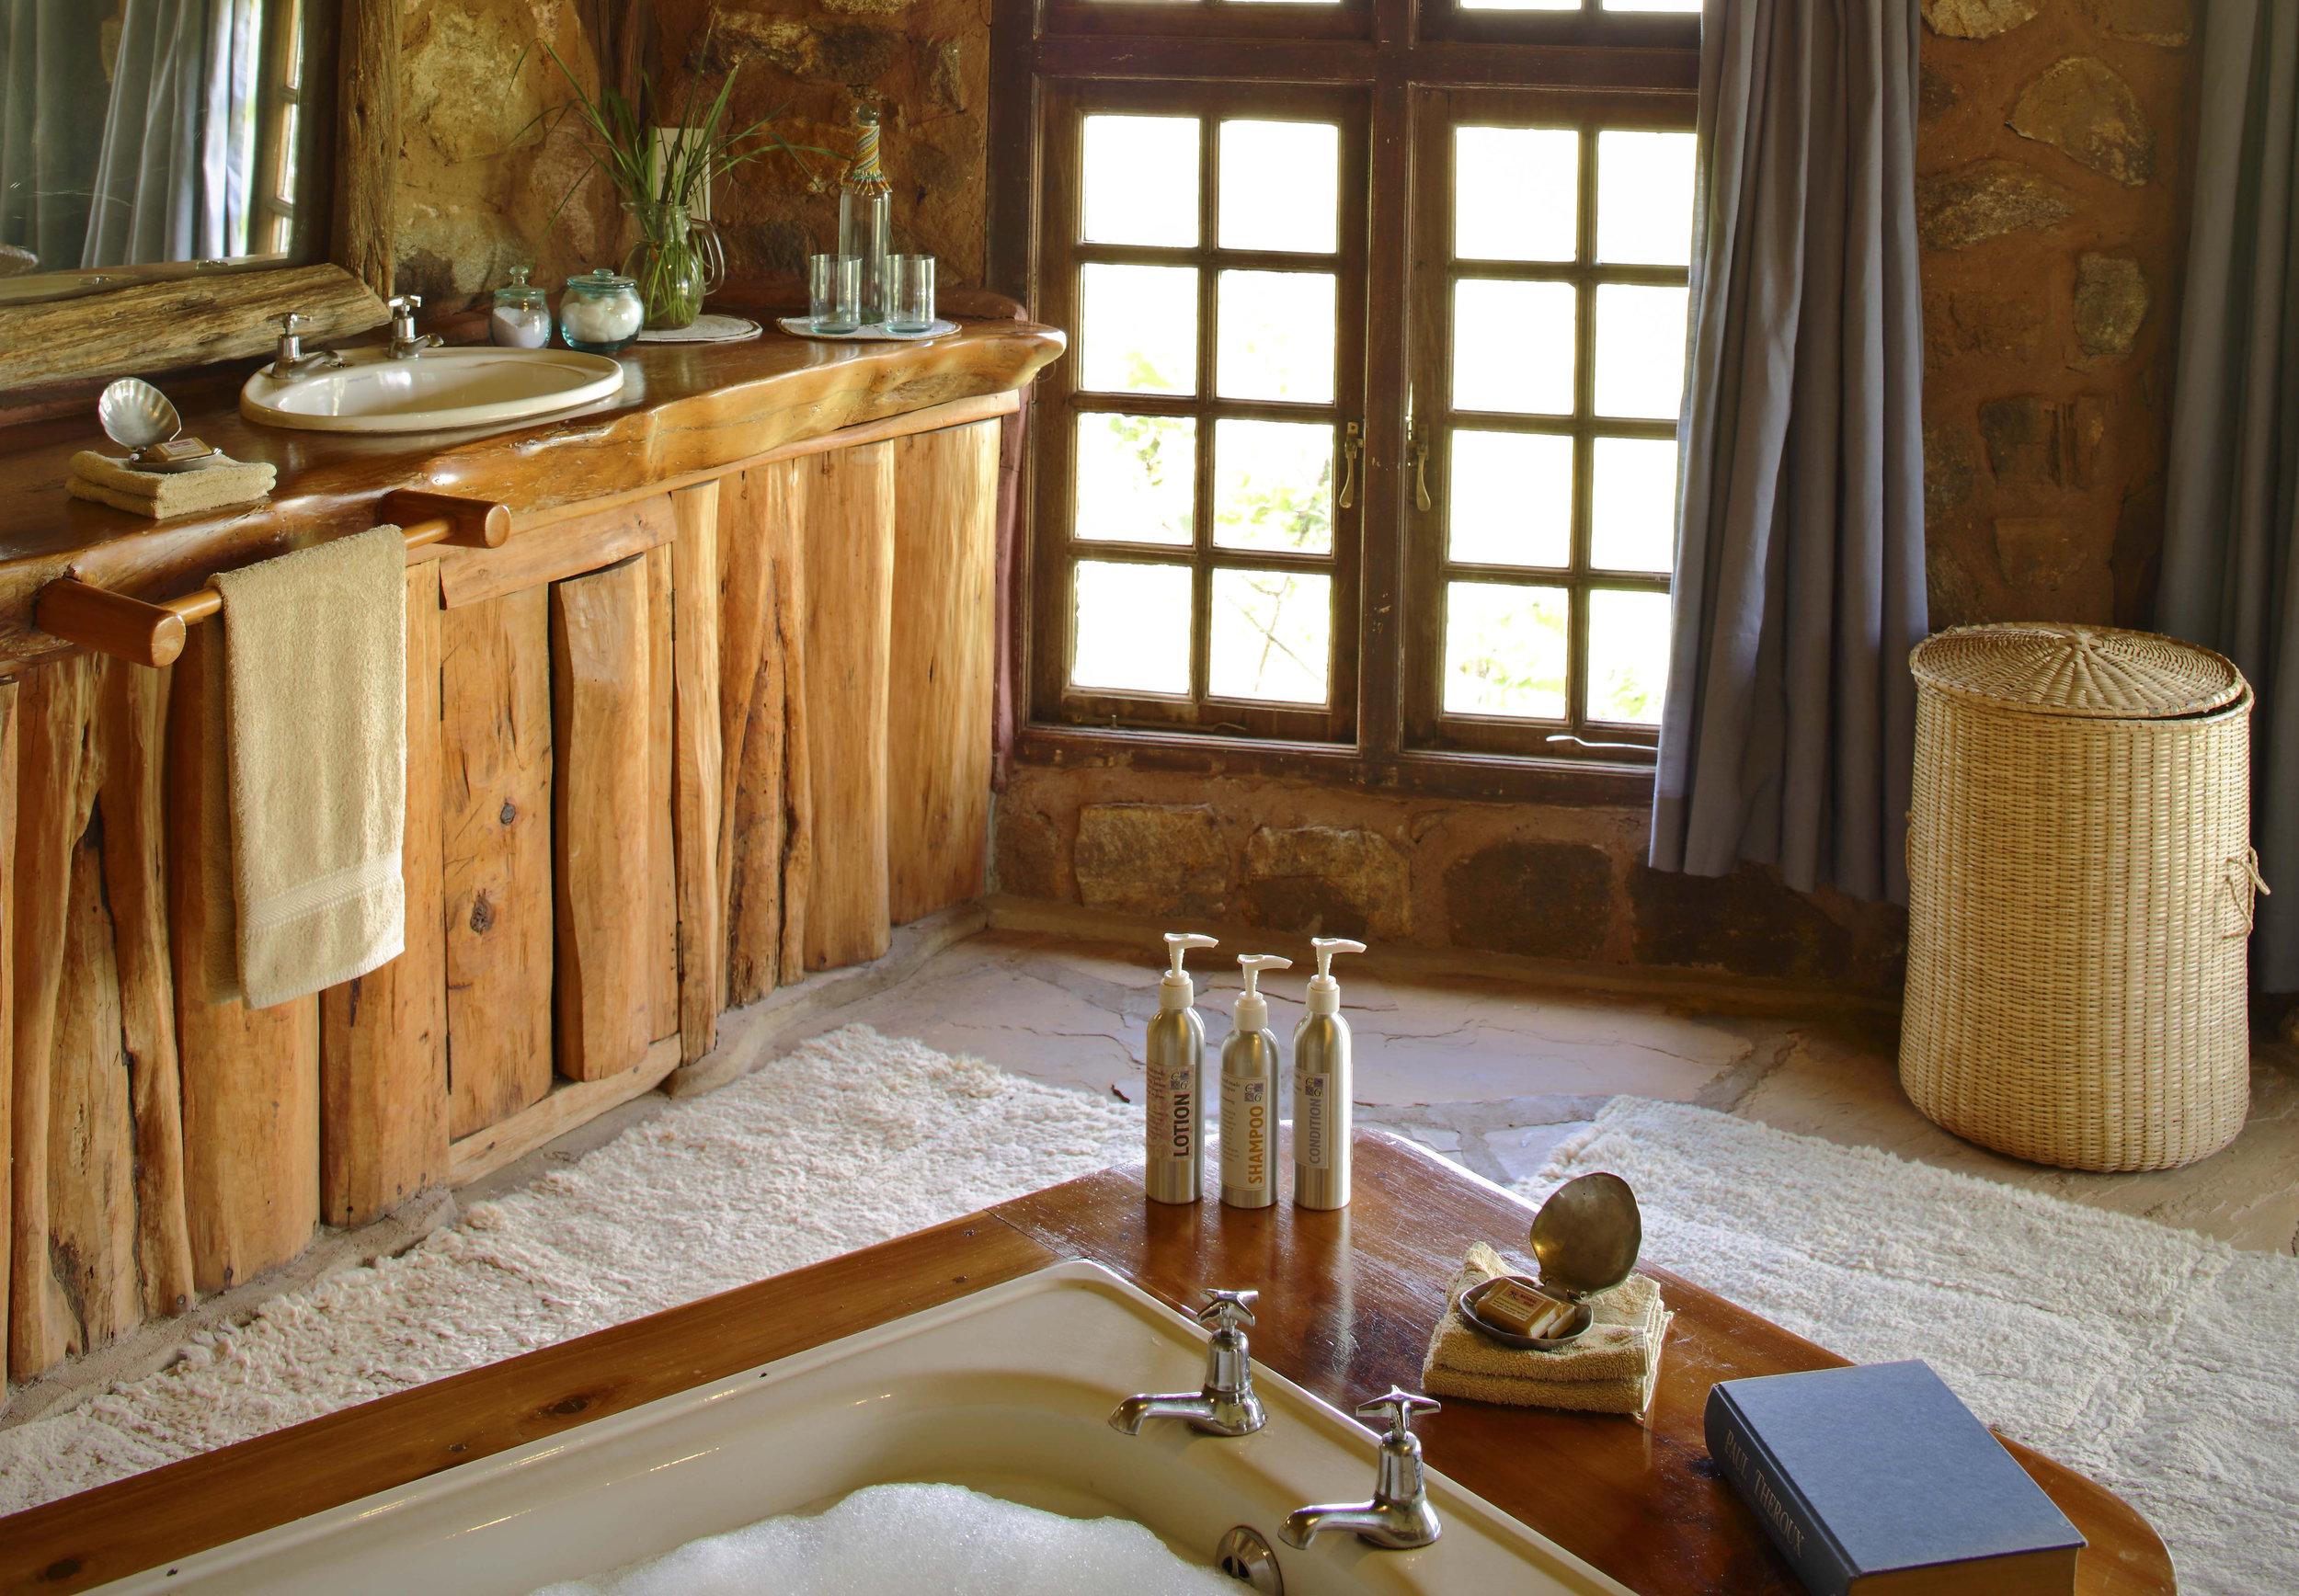 Borana 2018 Room 5 bathroom2.jpg